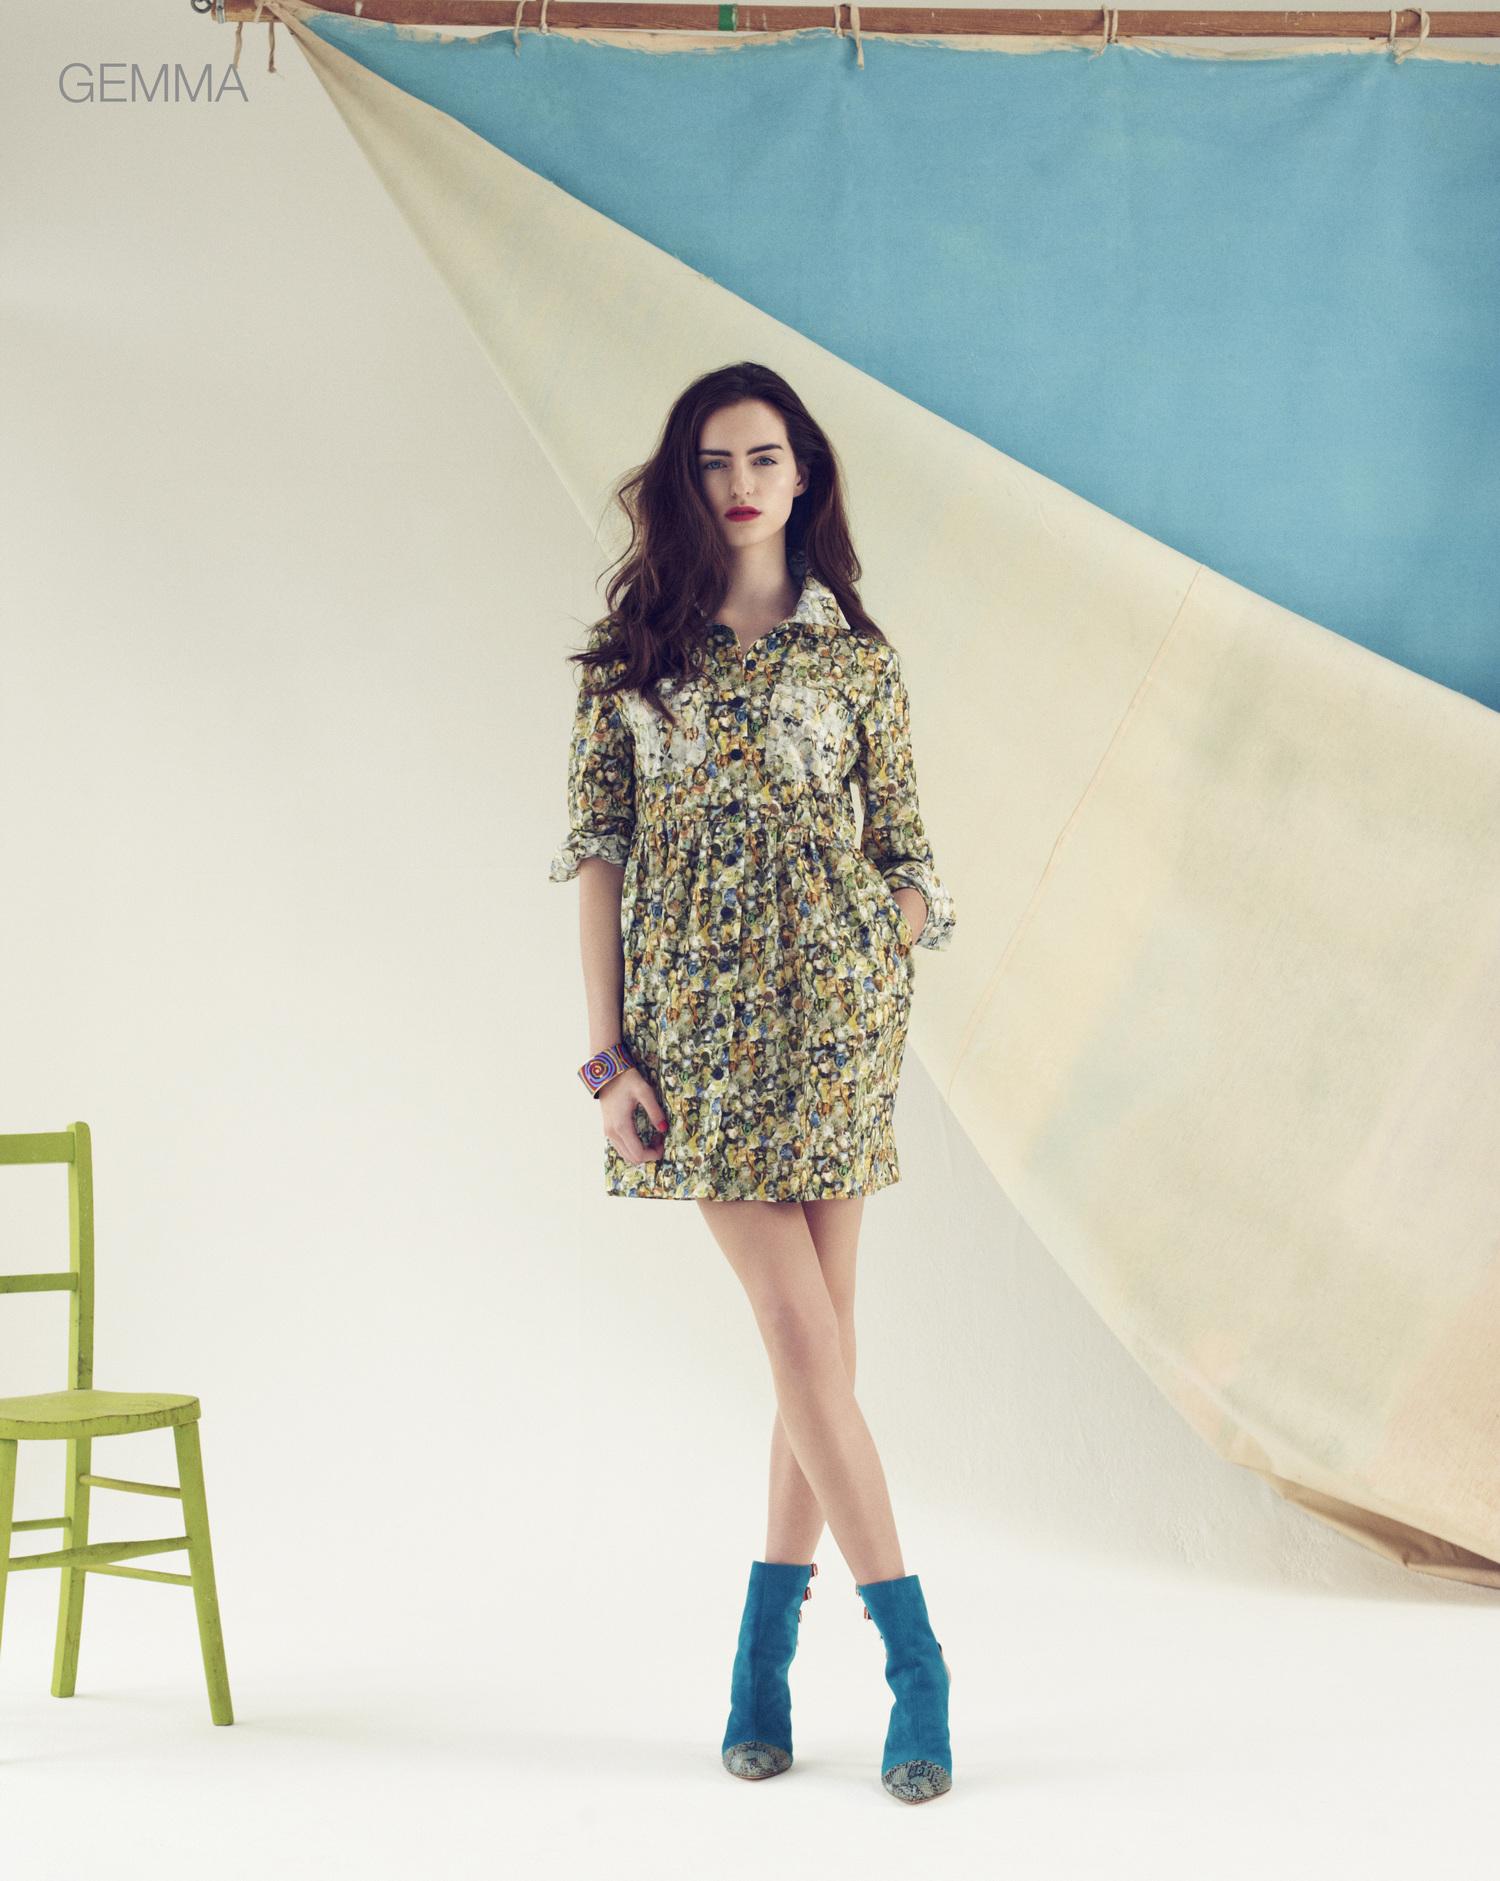 London Stylist Ellie Lines Poolside Collection Gemma Silk Shirt Dress